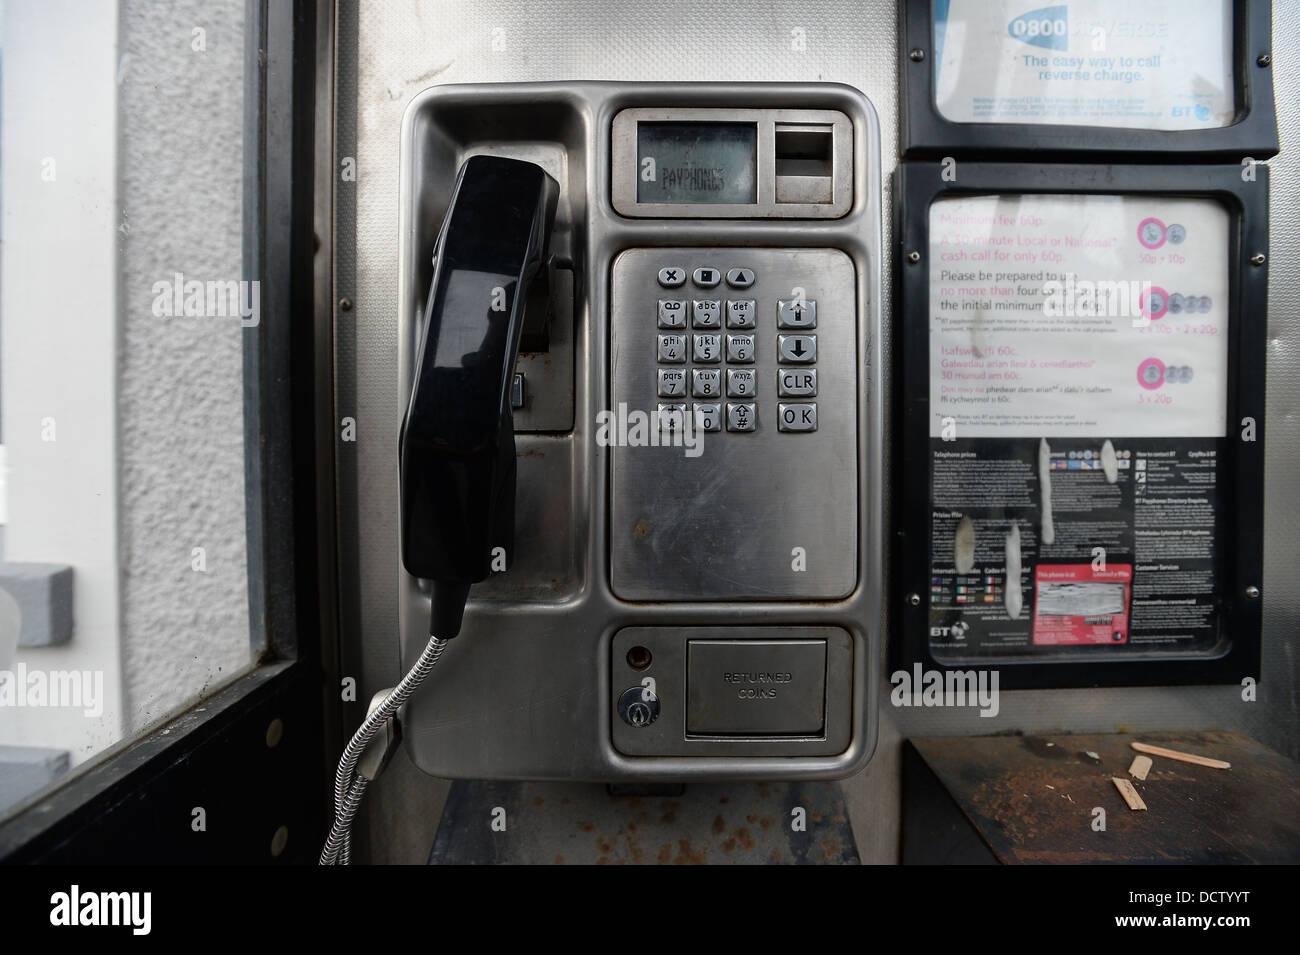 The inside of a British Telecom (BT) telephone box. Stock Photo